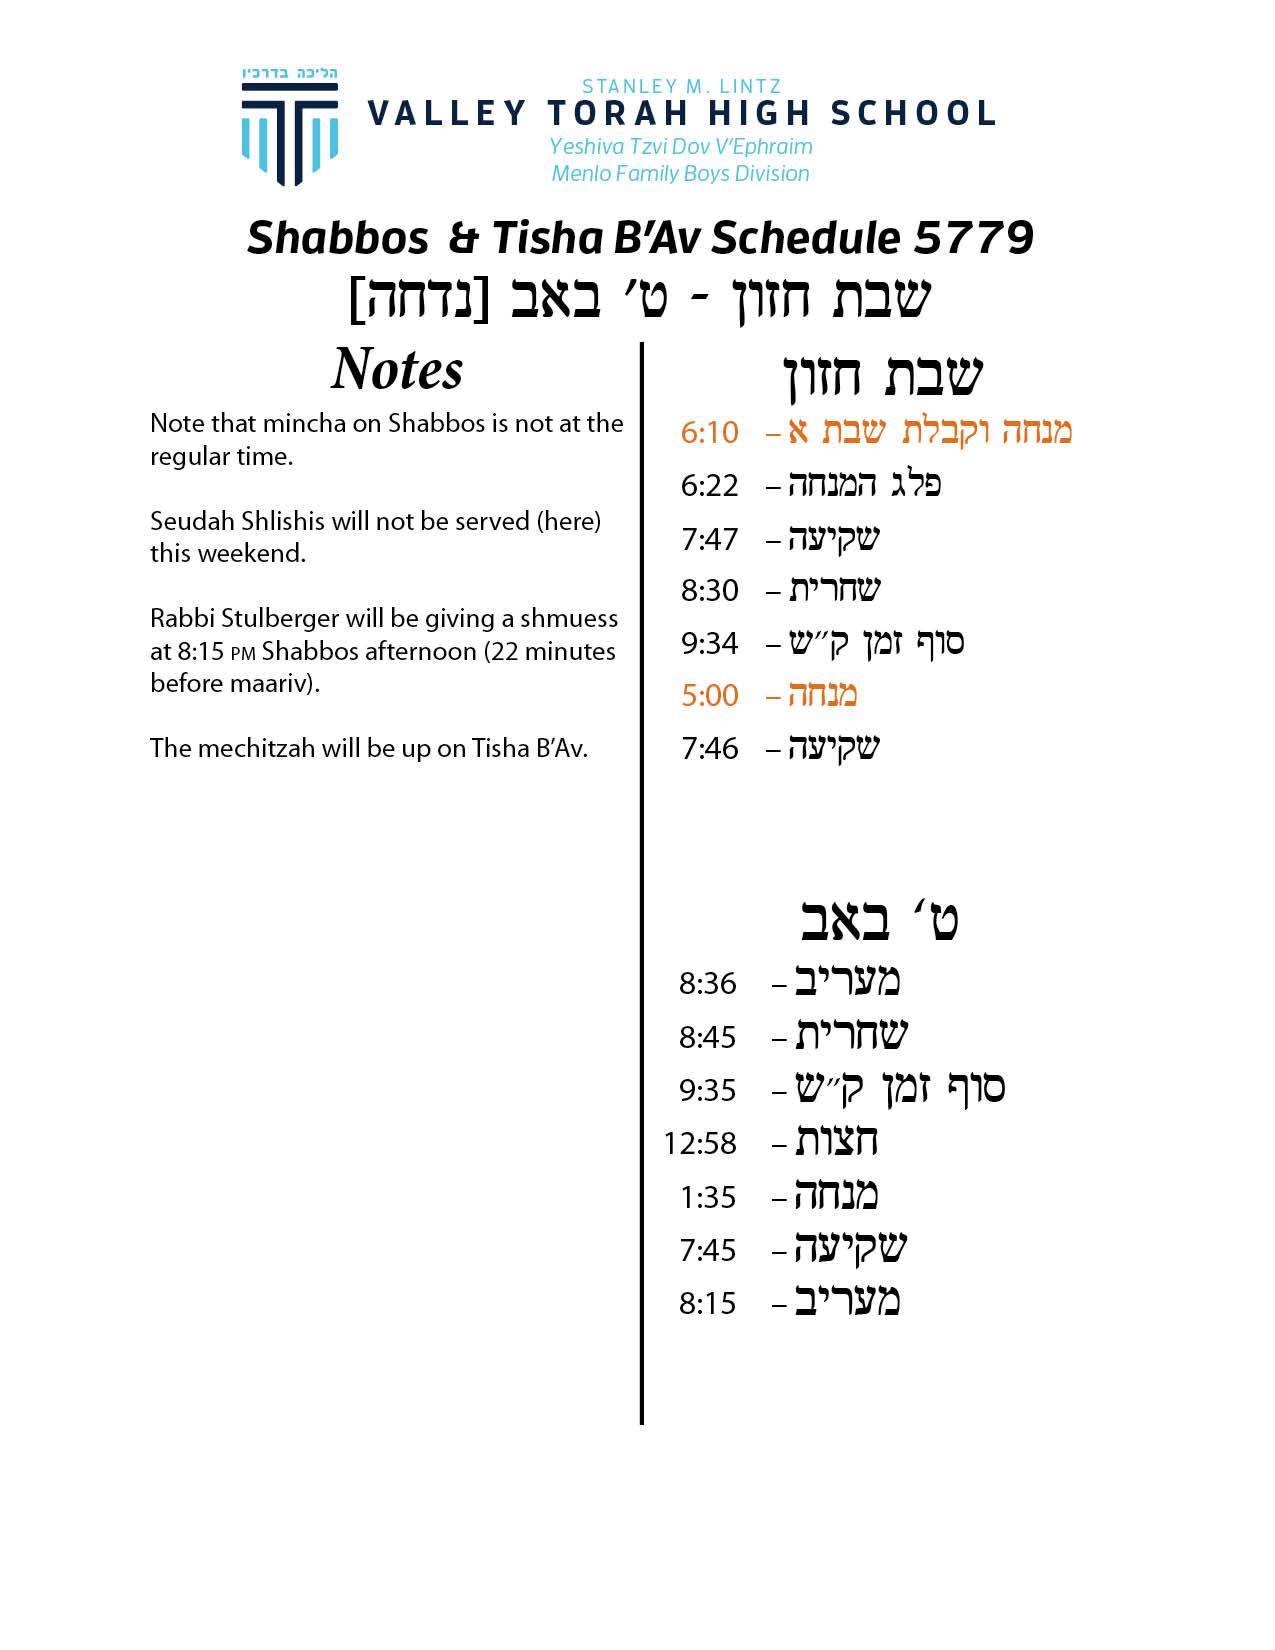 Tisha b'av Schedule 5779.jpg